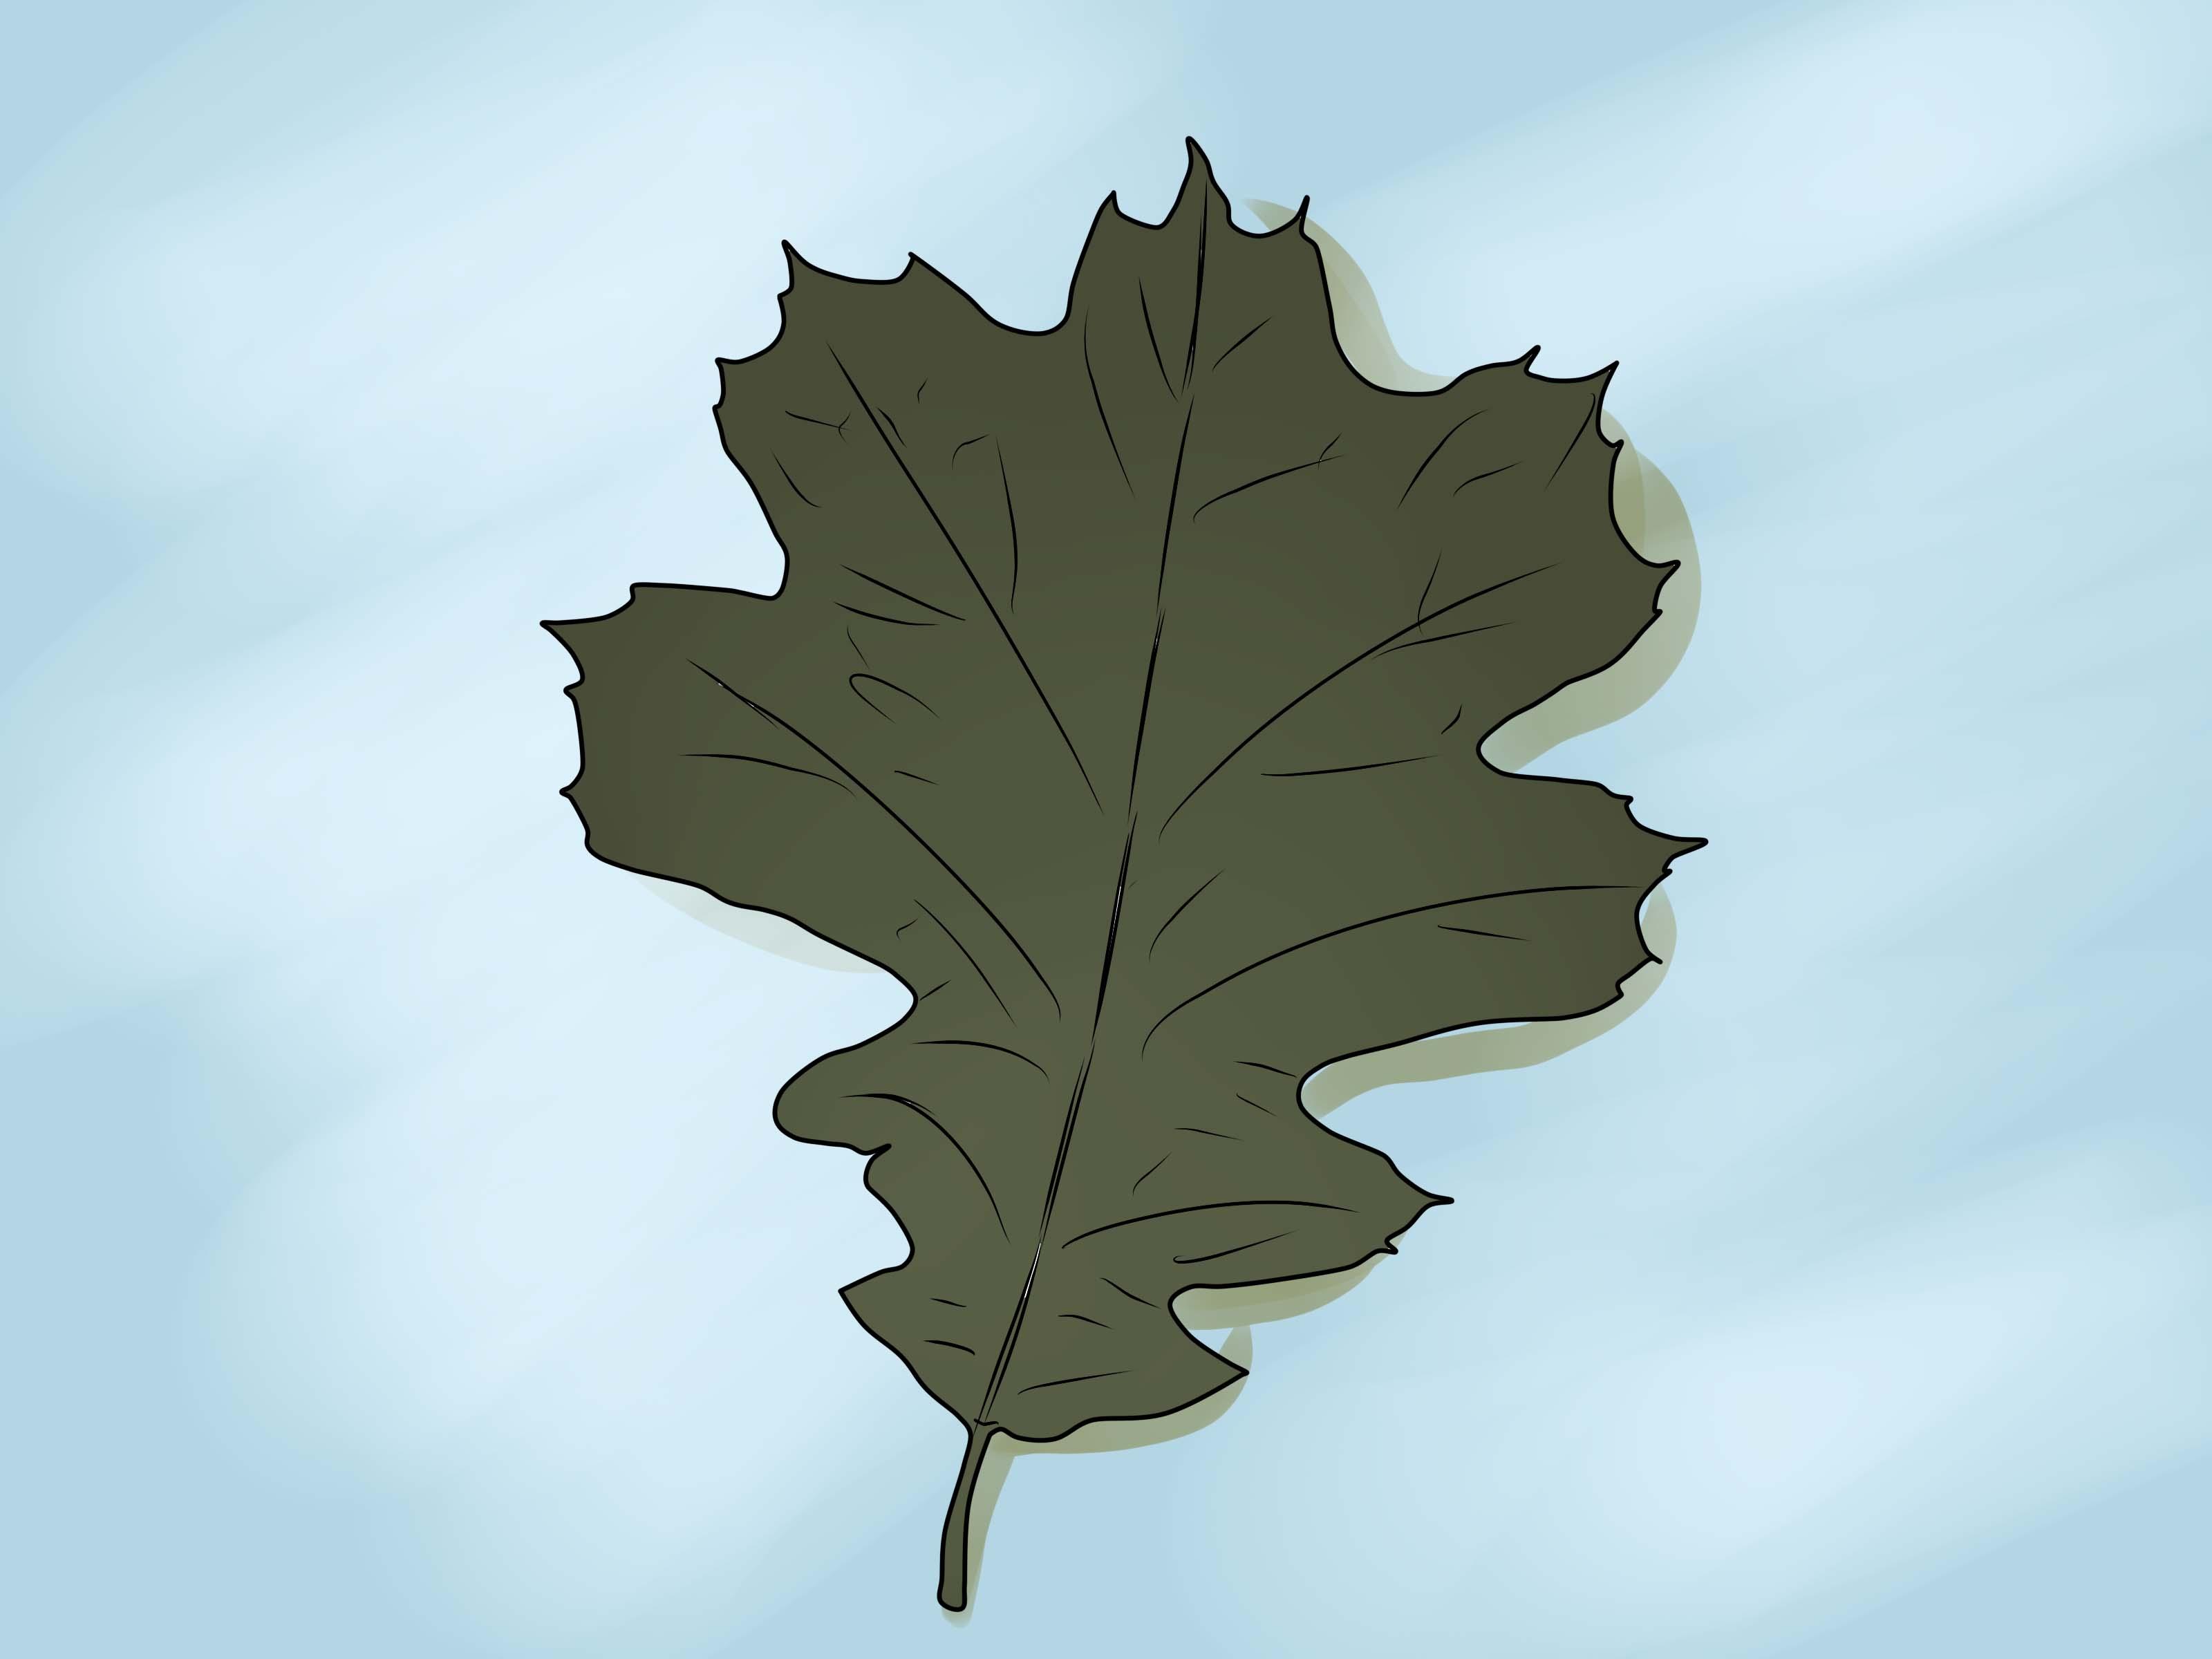 Florida Oak Tree Identification By Leaf